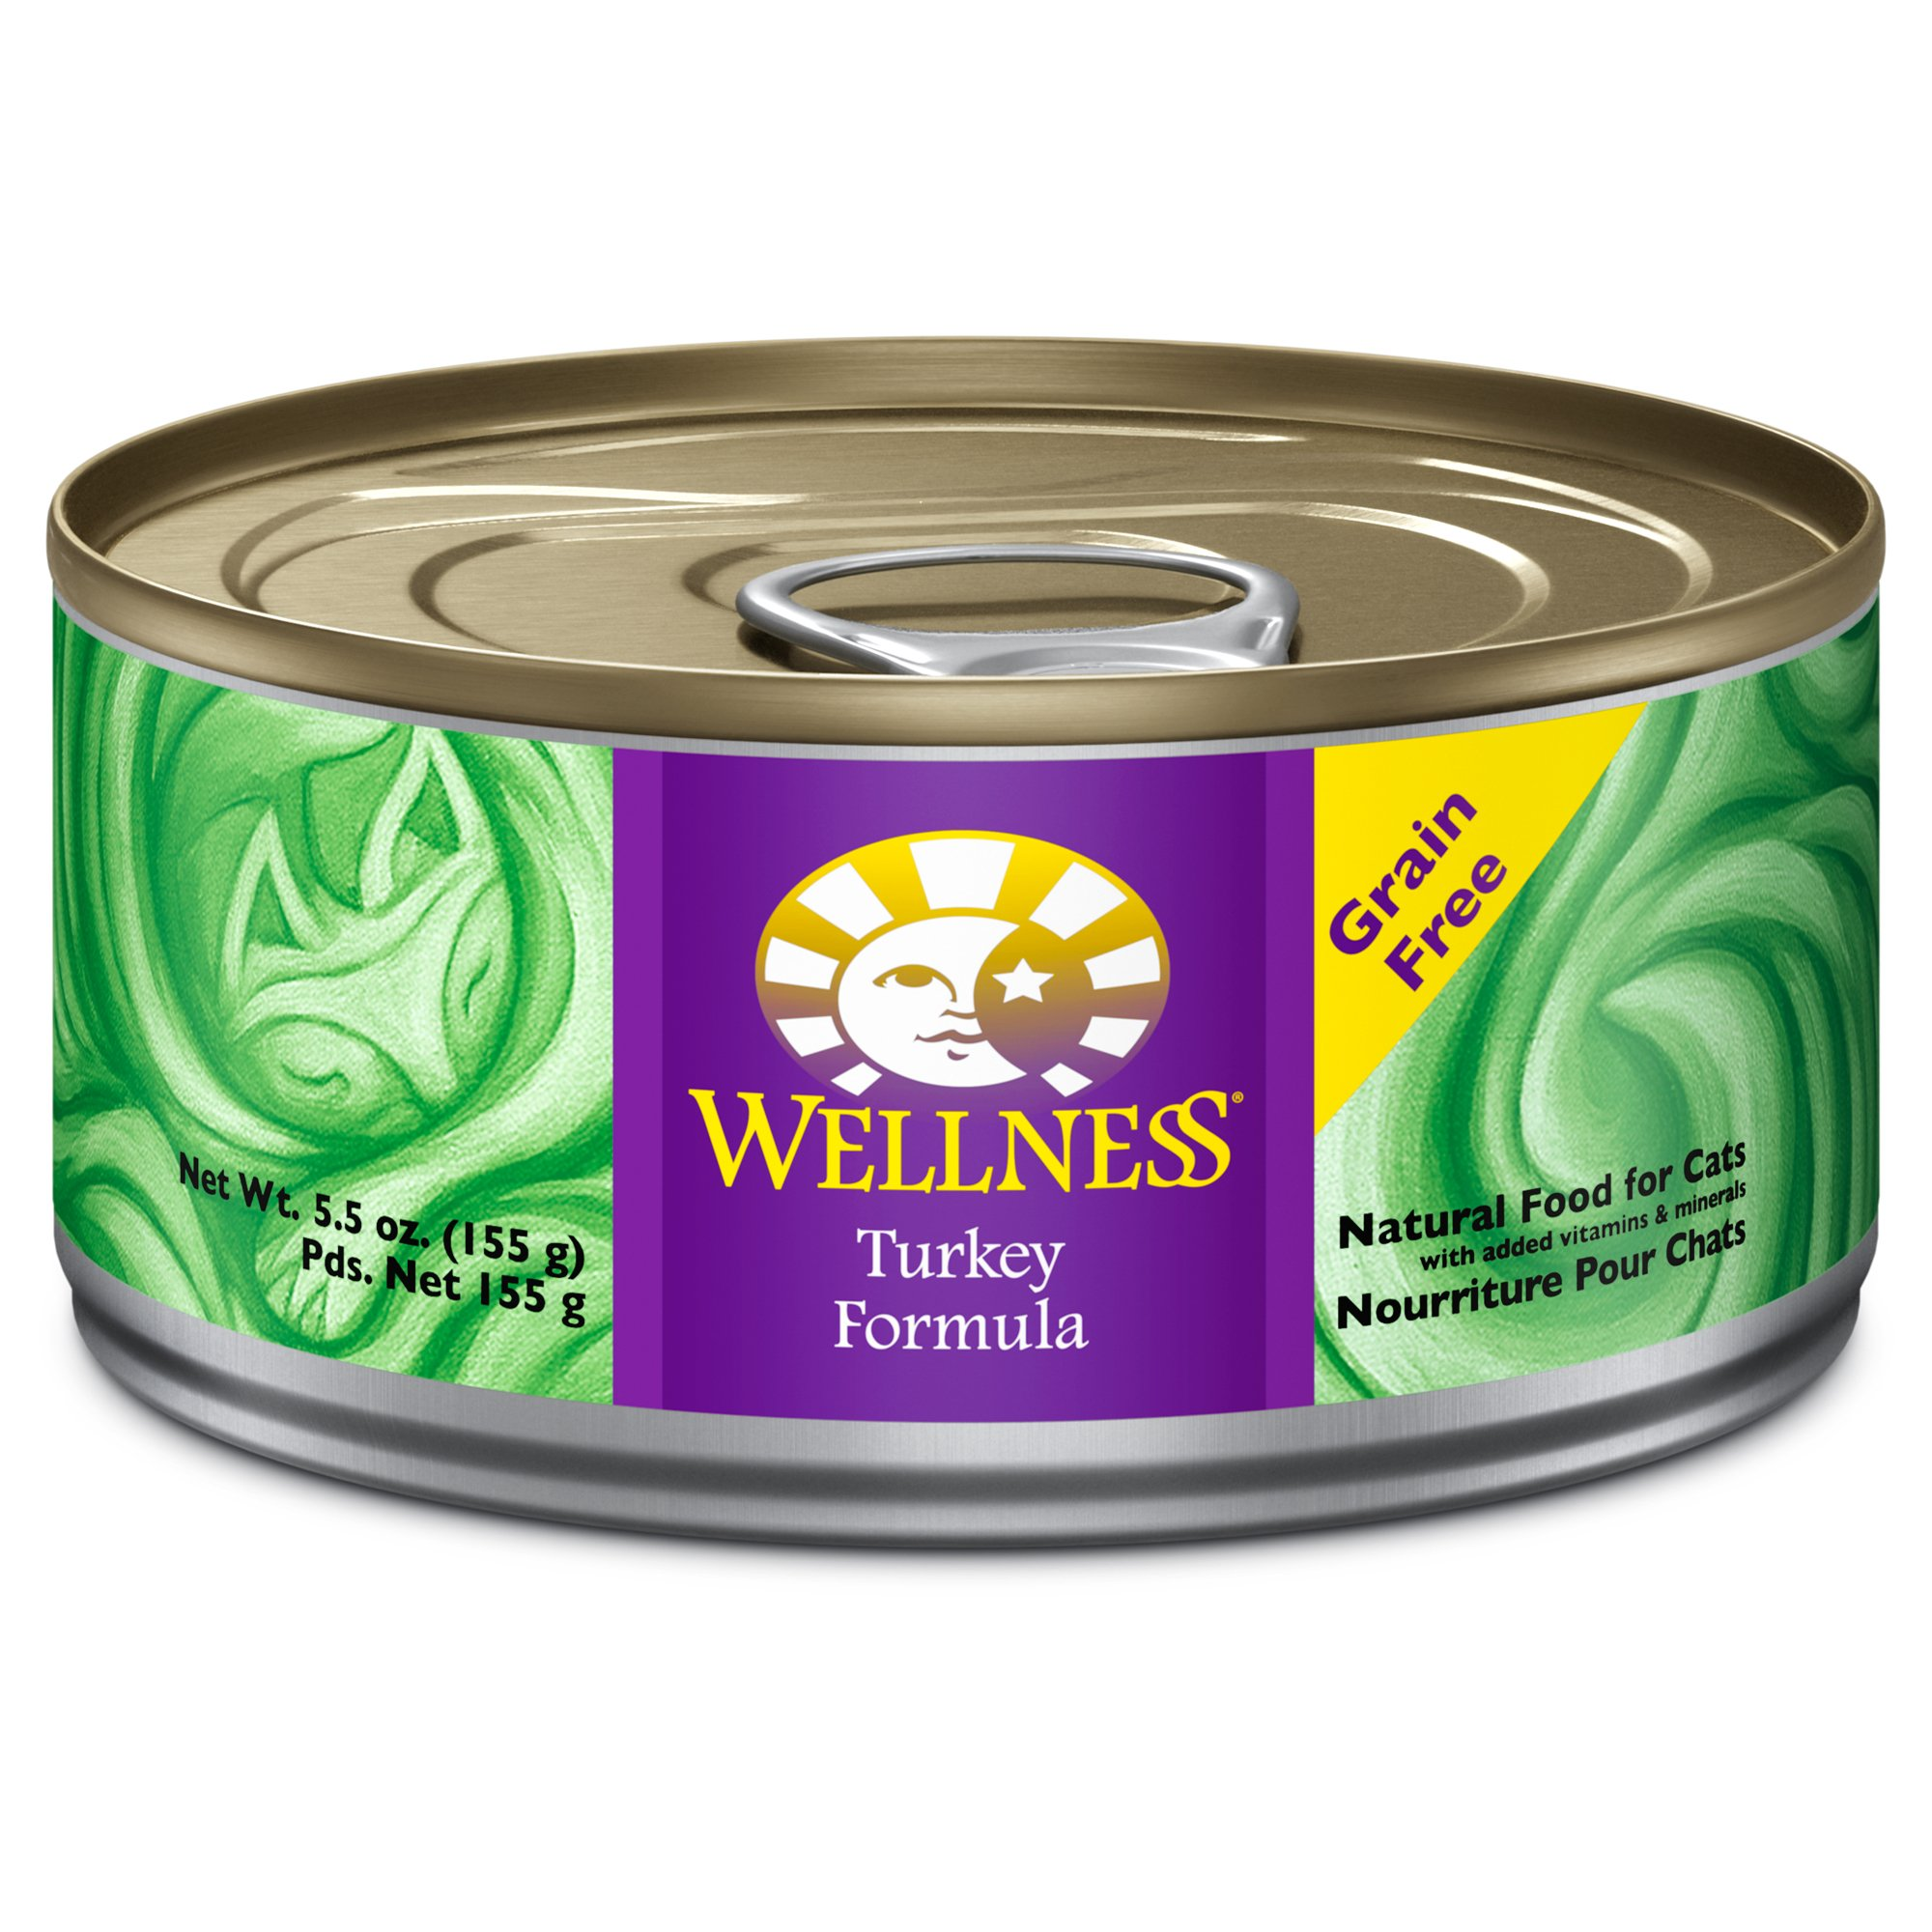 Wellness Adult Canned Cat Food, Turkey